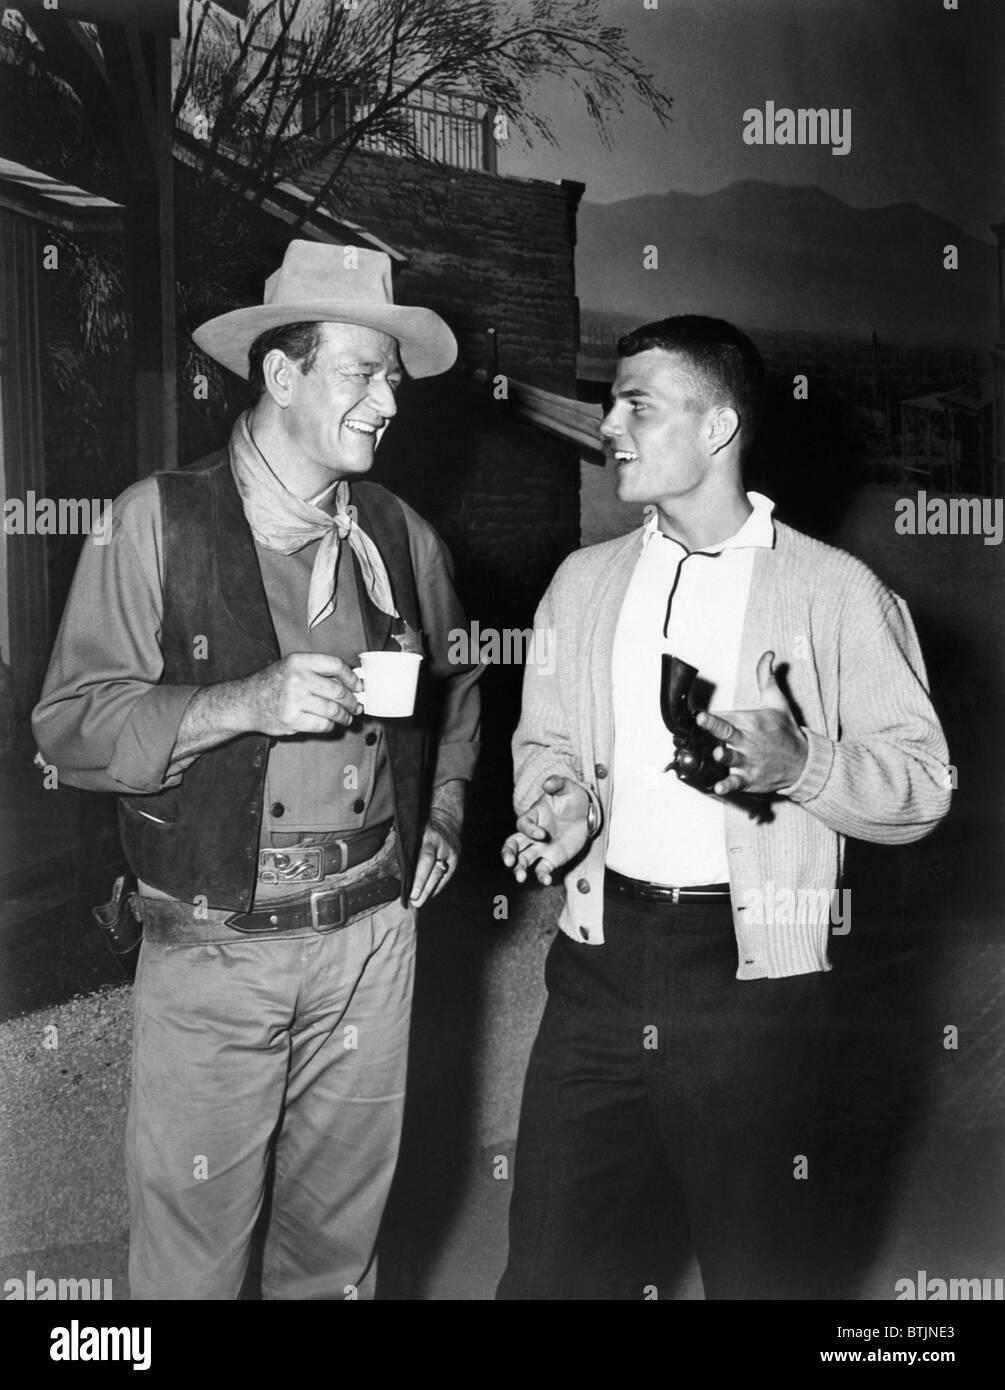 John Wayne, and his son, Pat Wayne, circa 1950s. CSU Archives/Courtesy Everett Collection - Stock Image